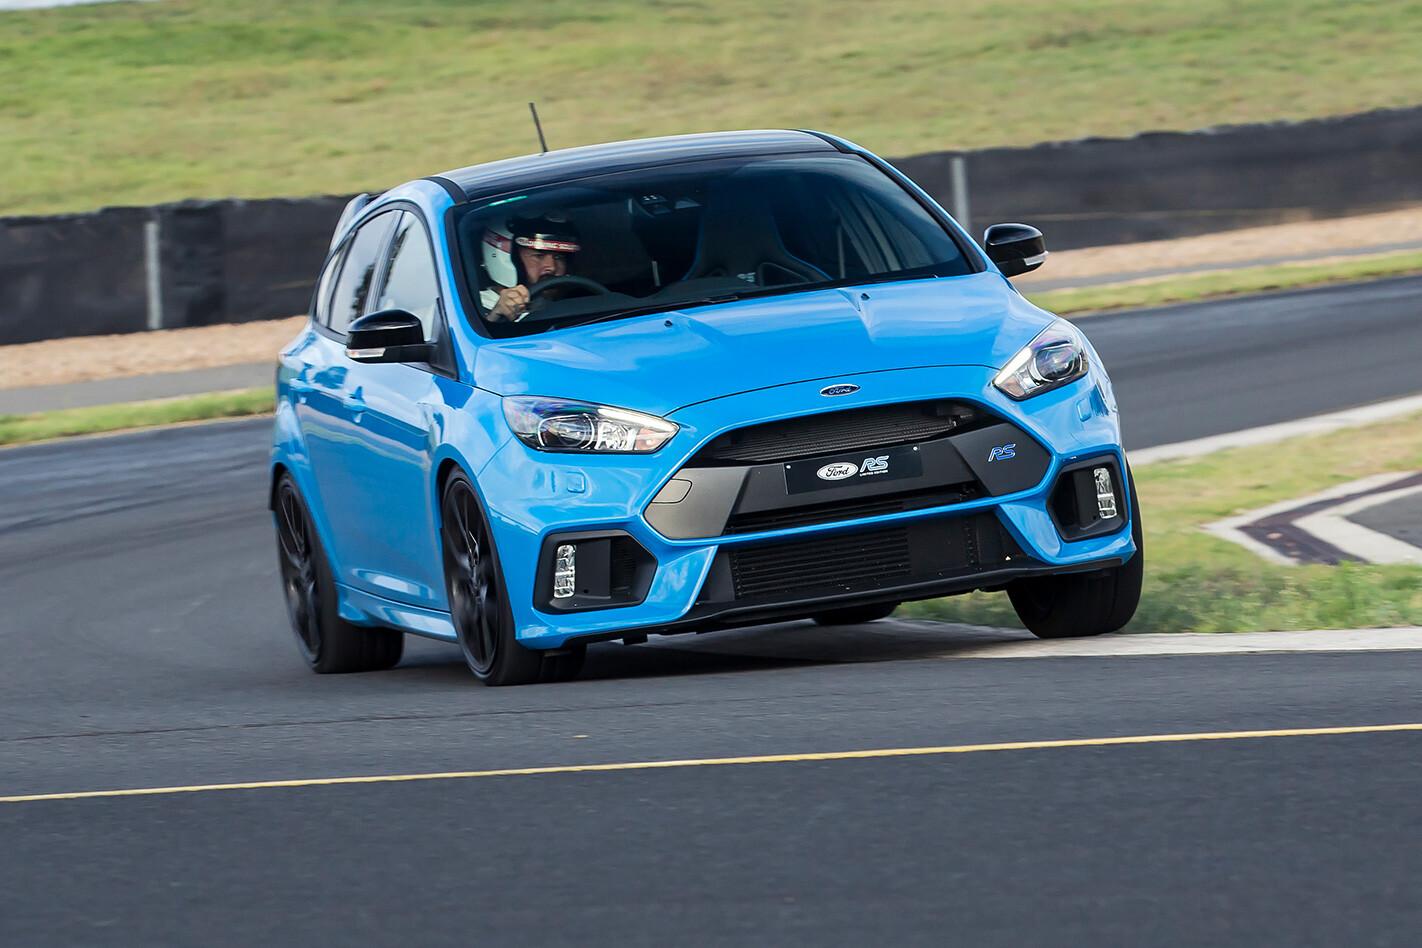 Ford Focus Rs Hp Jpg